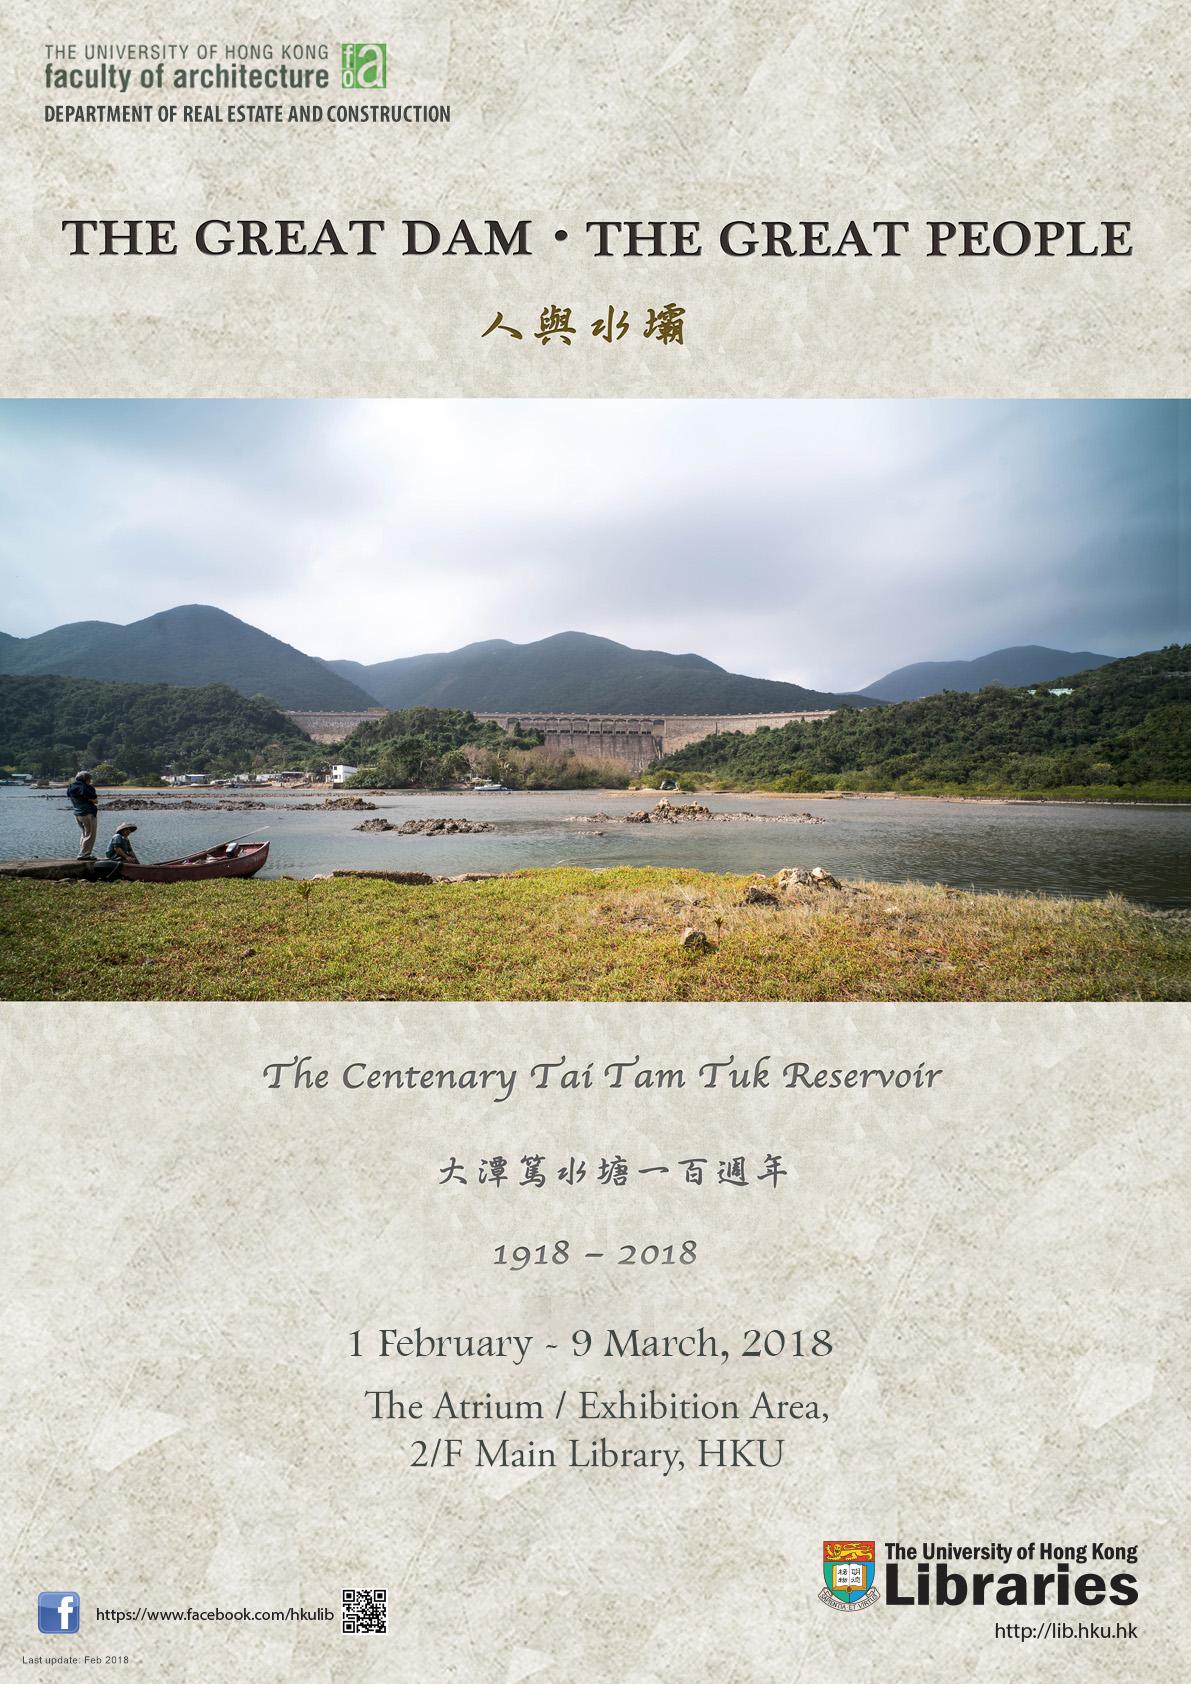 Commemorating the Centenary Tai Tam Tuk Reservoir – The Great Dam, the Great People